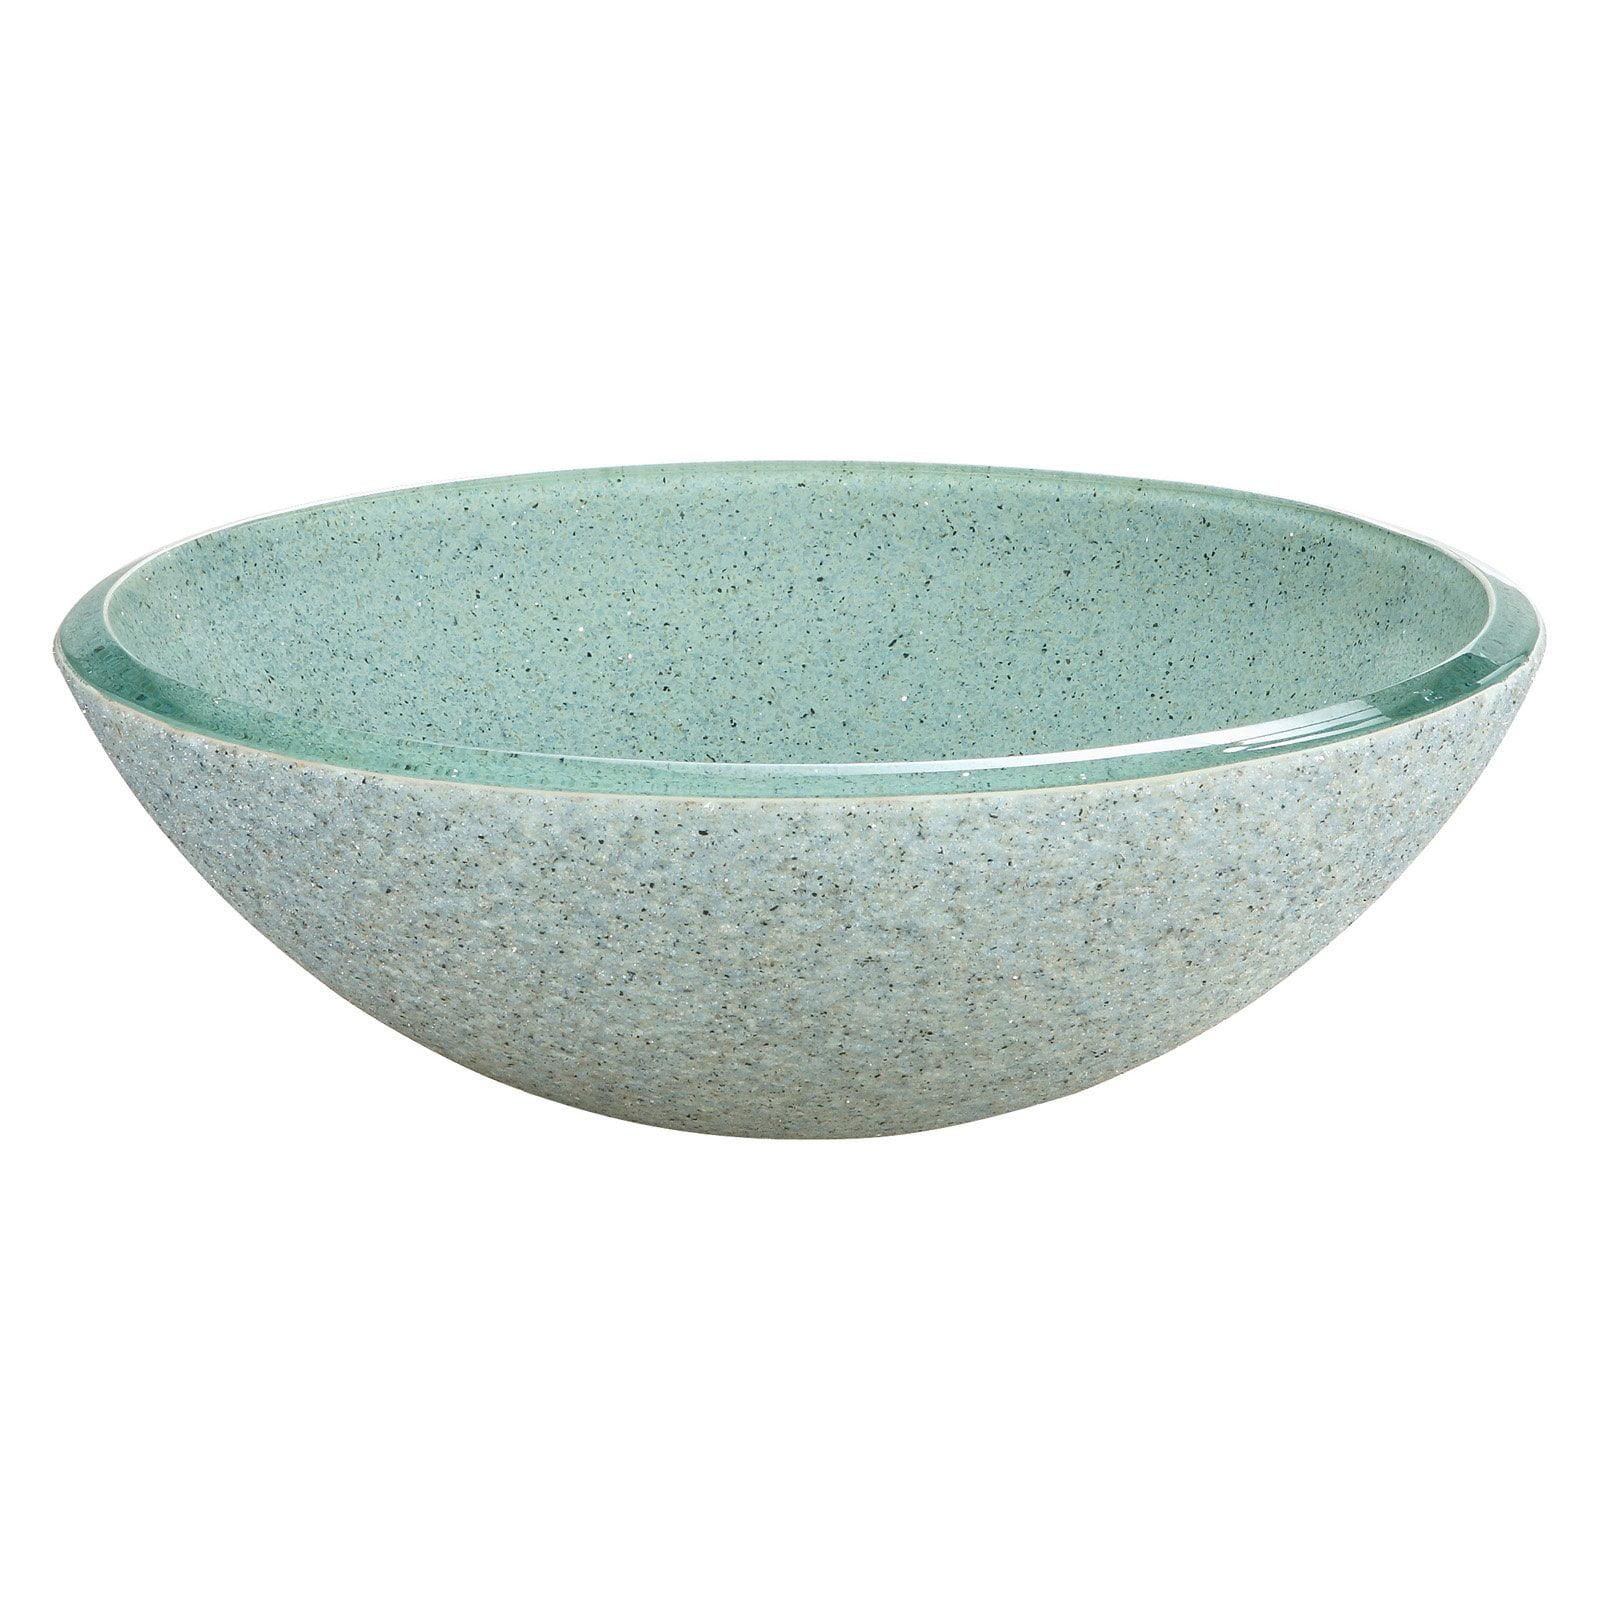 Xylem RVE165 Reflex Round Glass Vessel Sink - Azure Stone